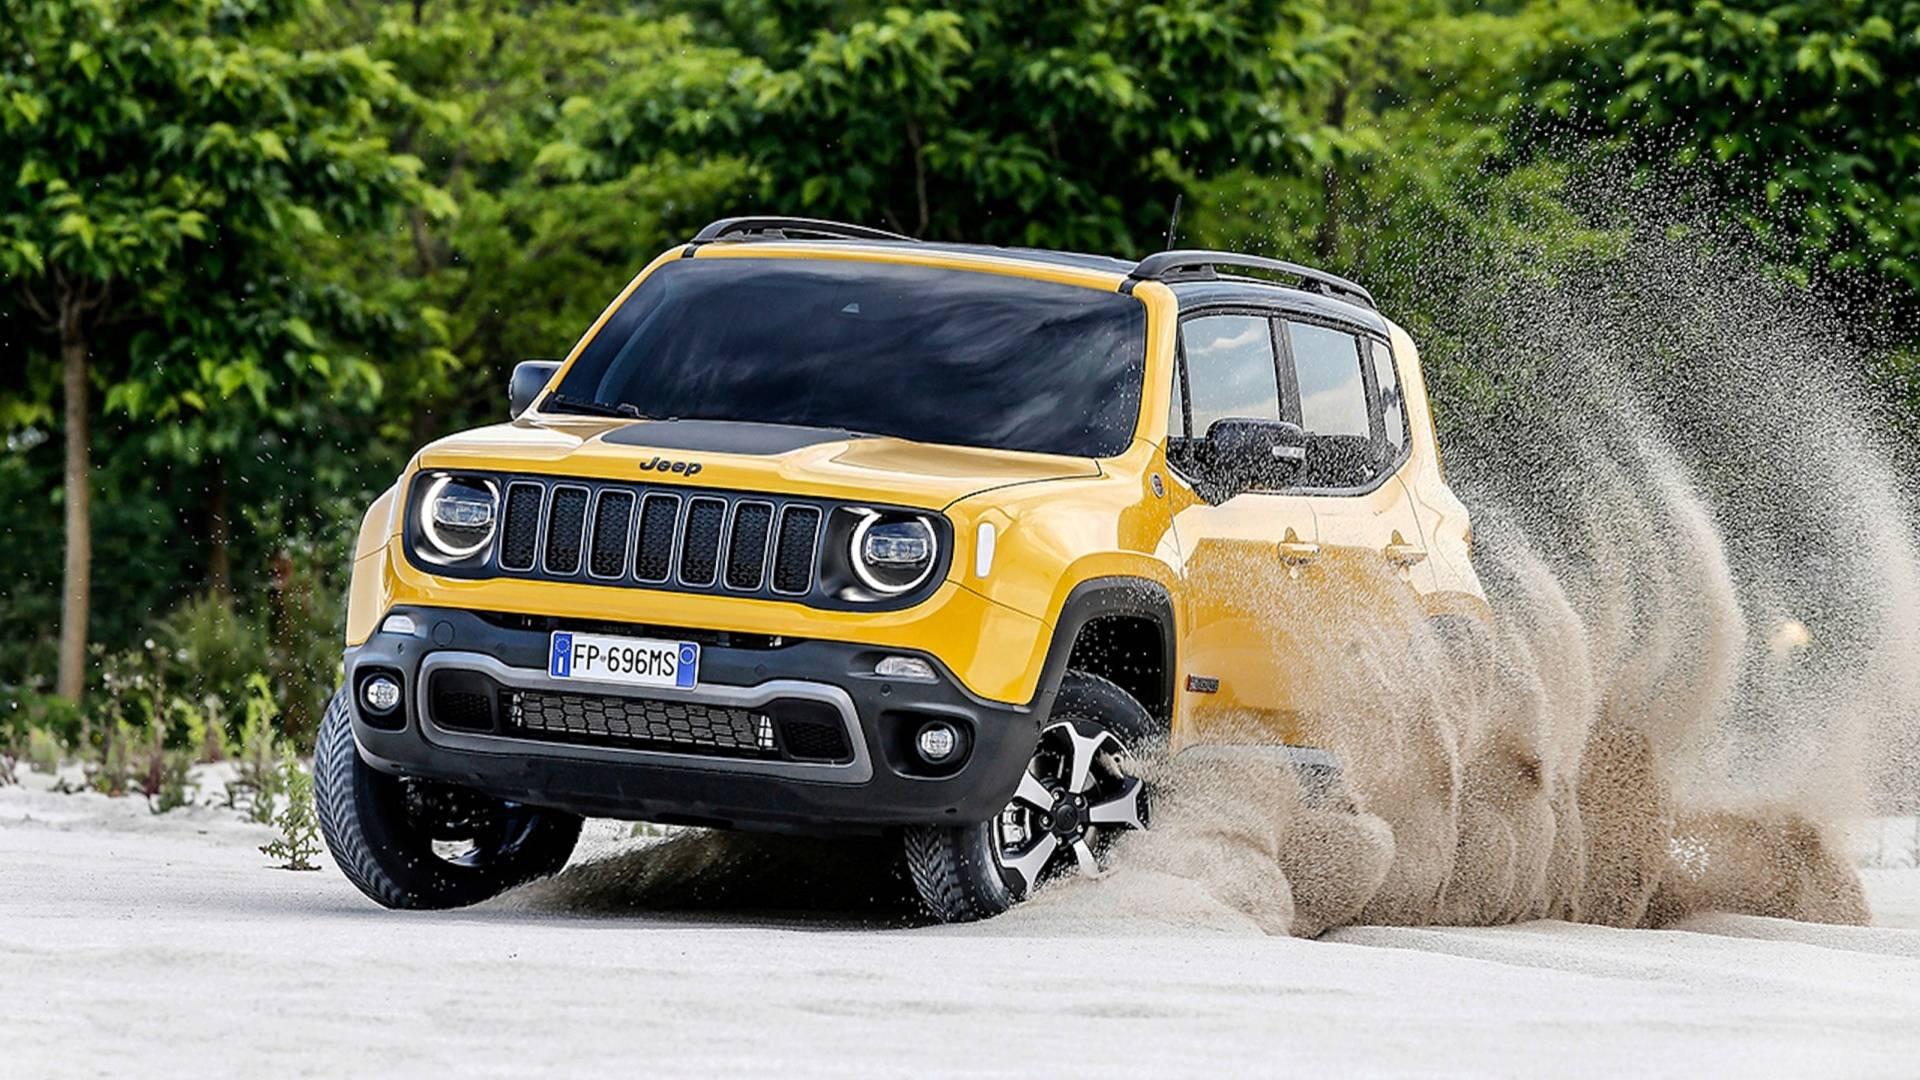 Jeep Renegade Facelift 2018 >> Fiat Workers at Melfi Plant Strike Over Cristiano Ronaldo's Juventus Transfer - autoevolution